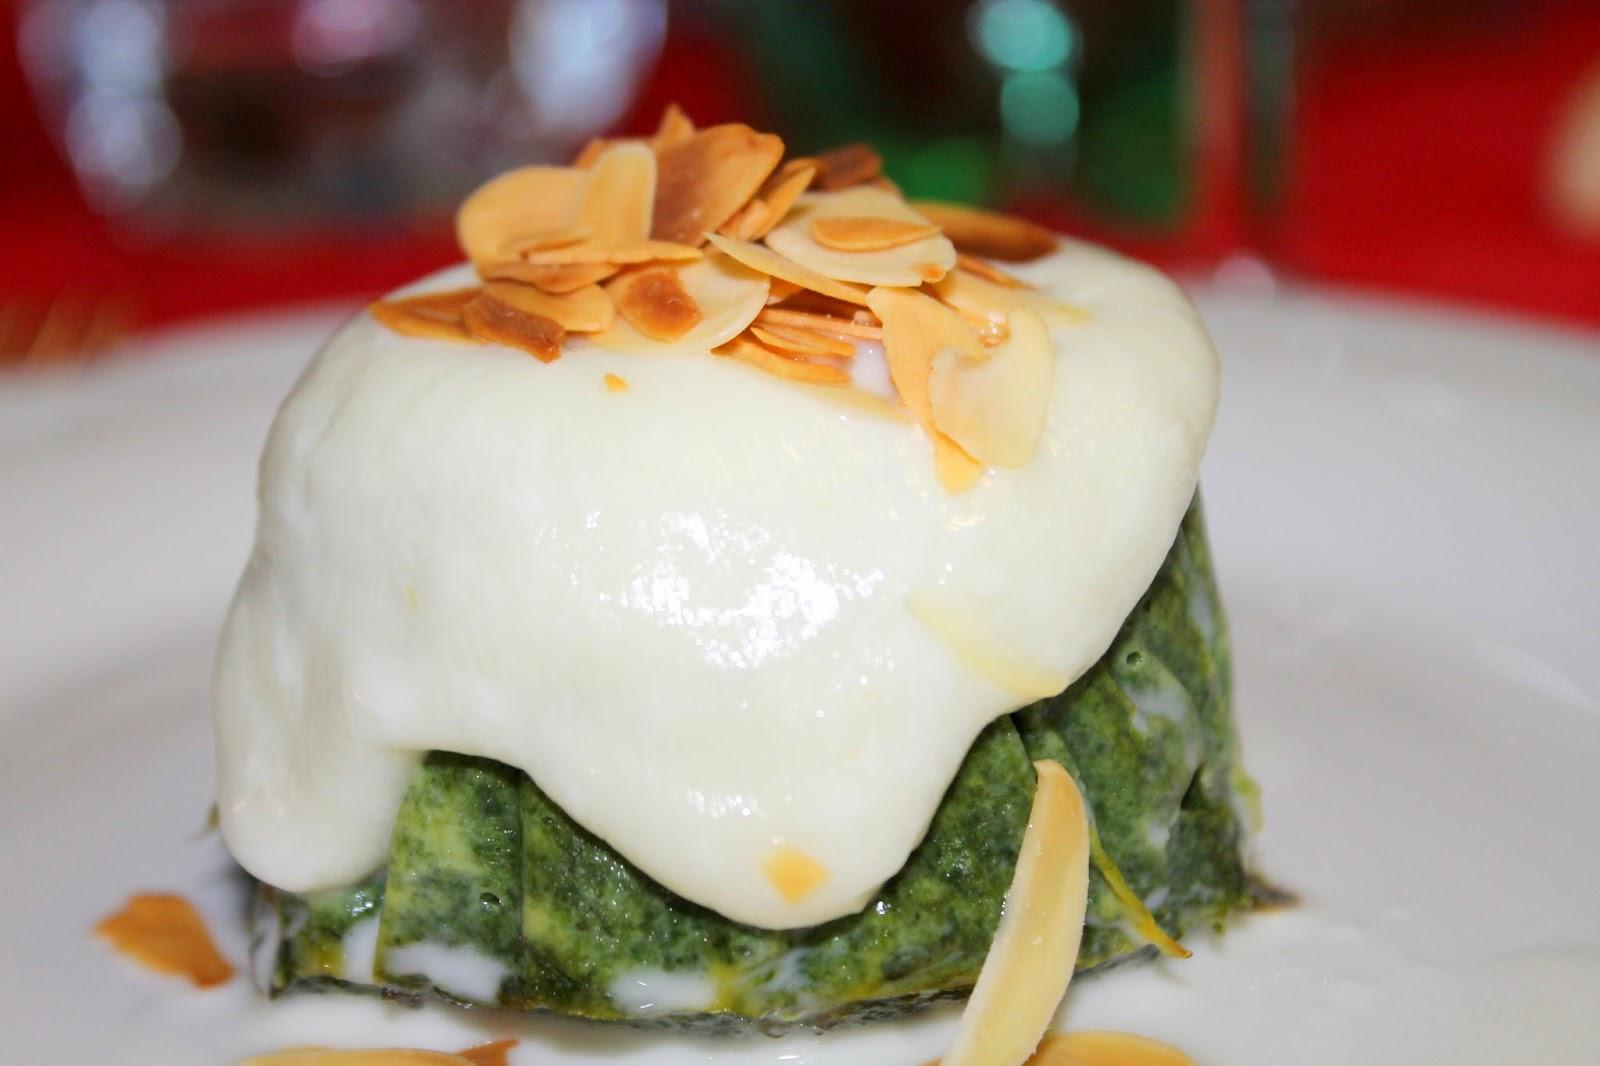 Antipasti Vegetariani Di Natale.Menu Di Natale Vegetariano 5 Ricette Dall Antipasto Al Dolce Pourfemme